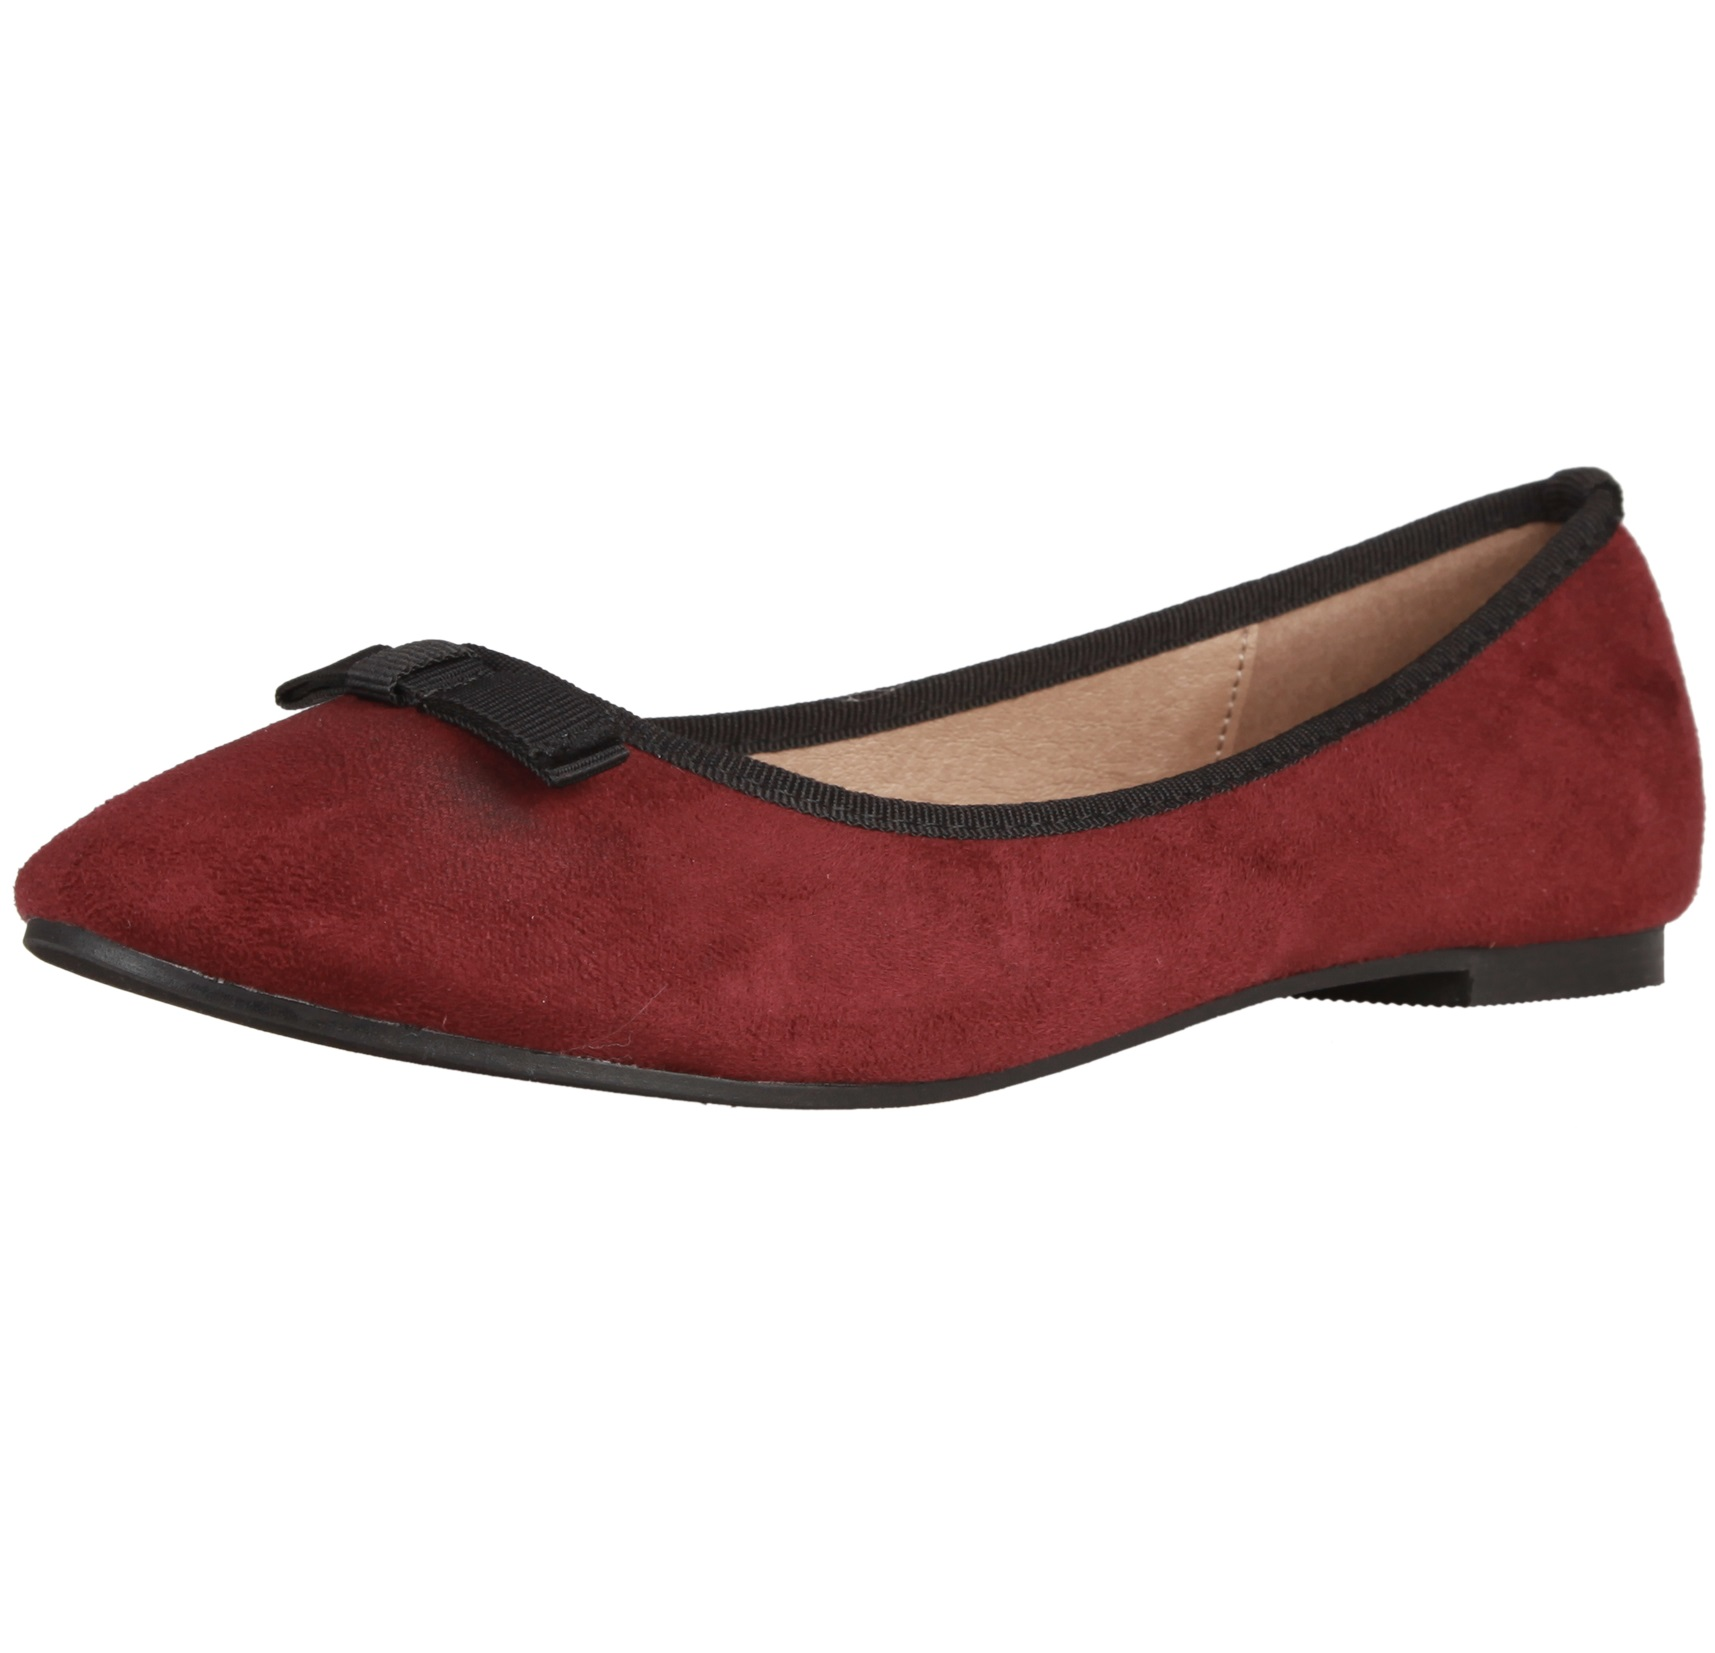 Ana Lublin Flat Shoes Lina Bordo Rf600183